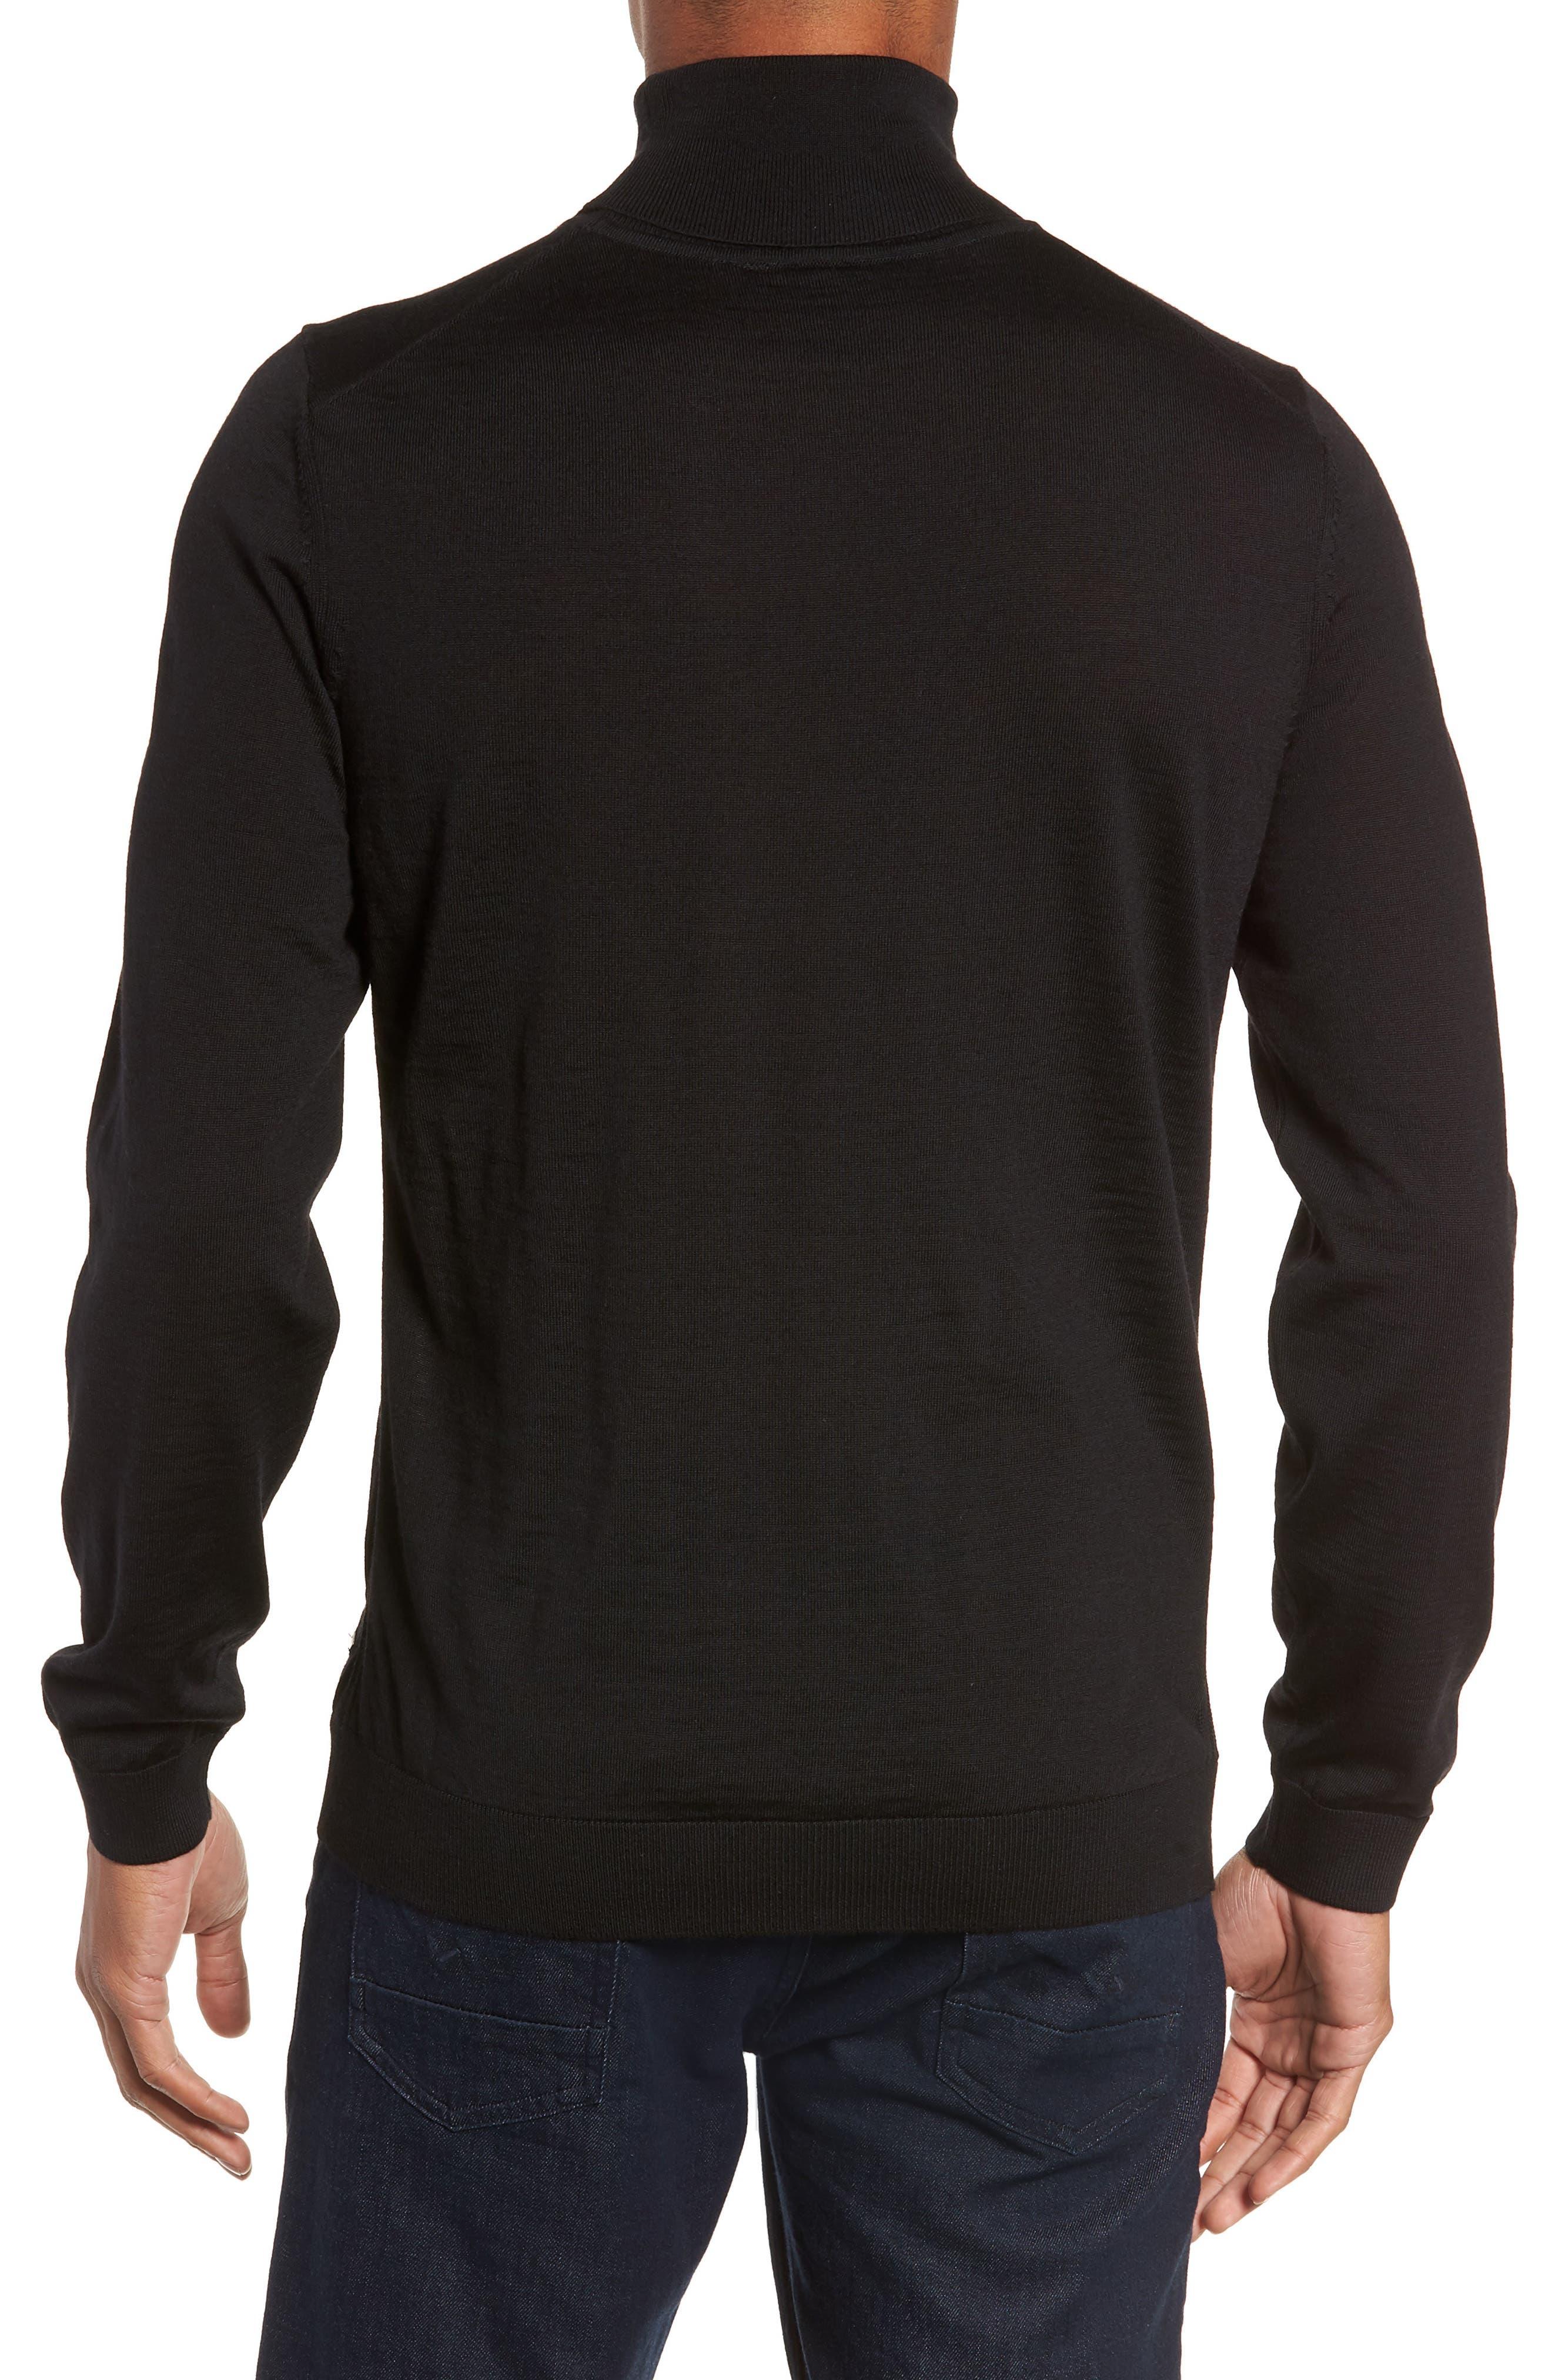 Musso Slim Fit Wool Turtleneck Sweater,                             Alternate thumbnail 2, color,                             BLACK